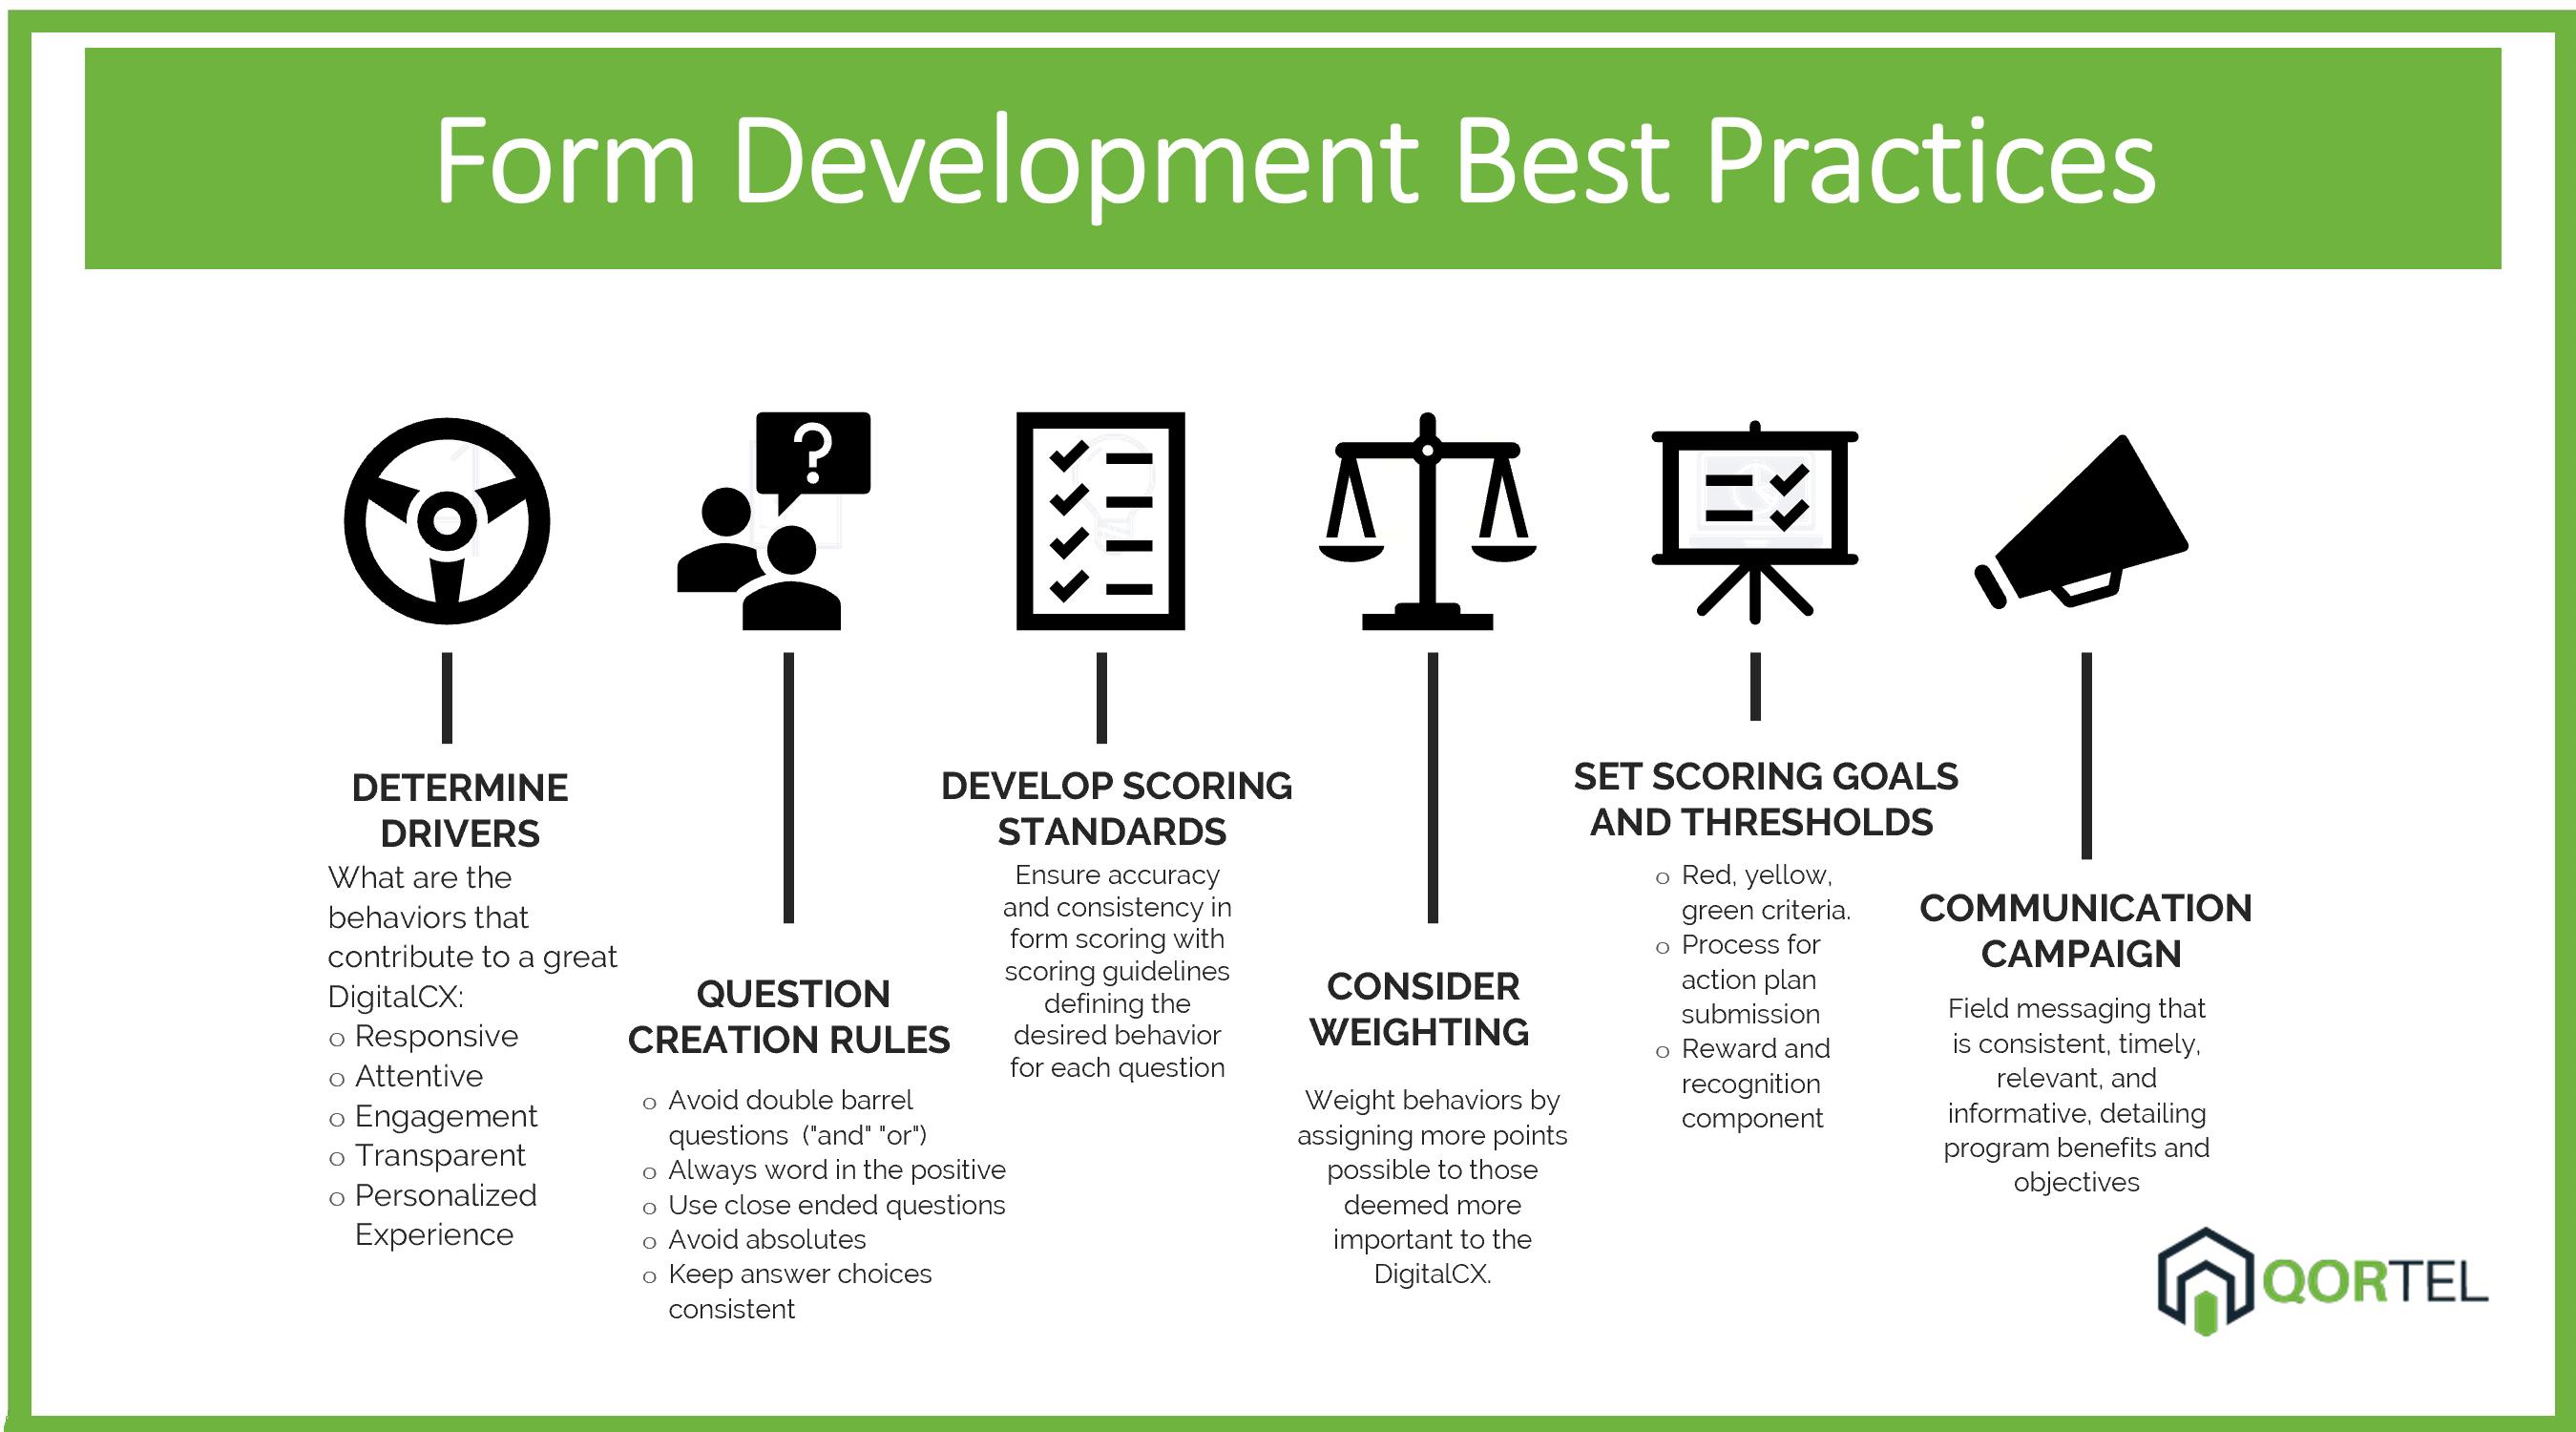 Form Devlopment Best Practices